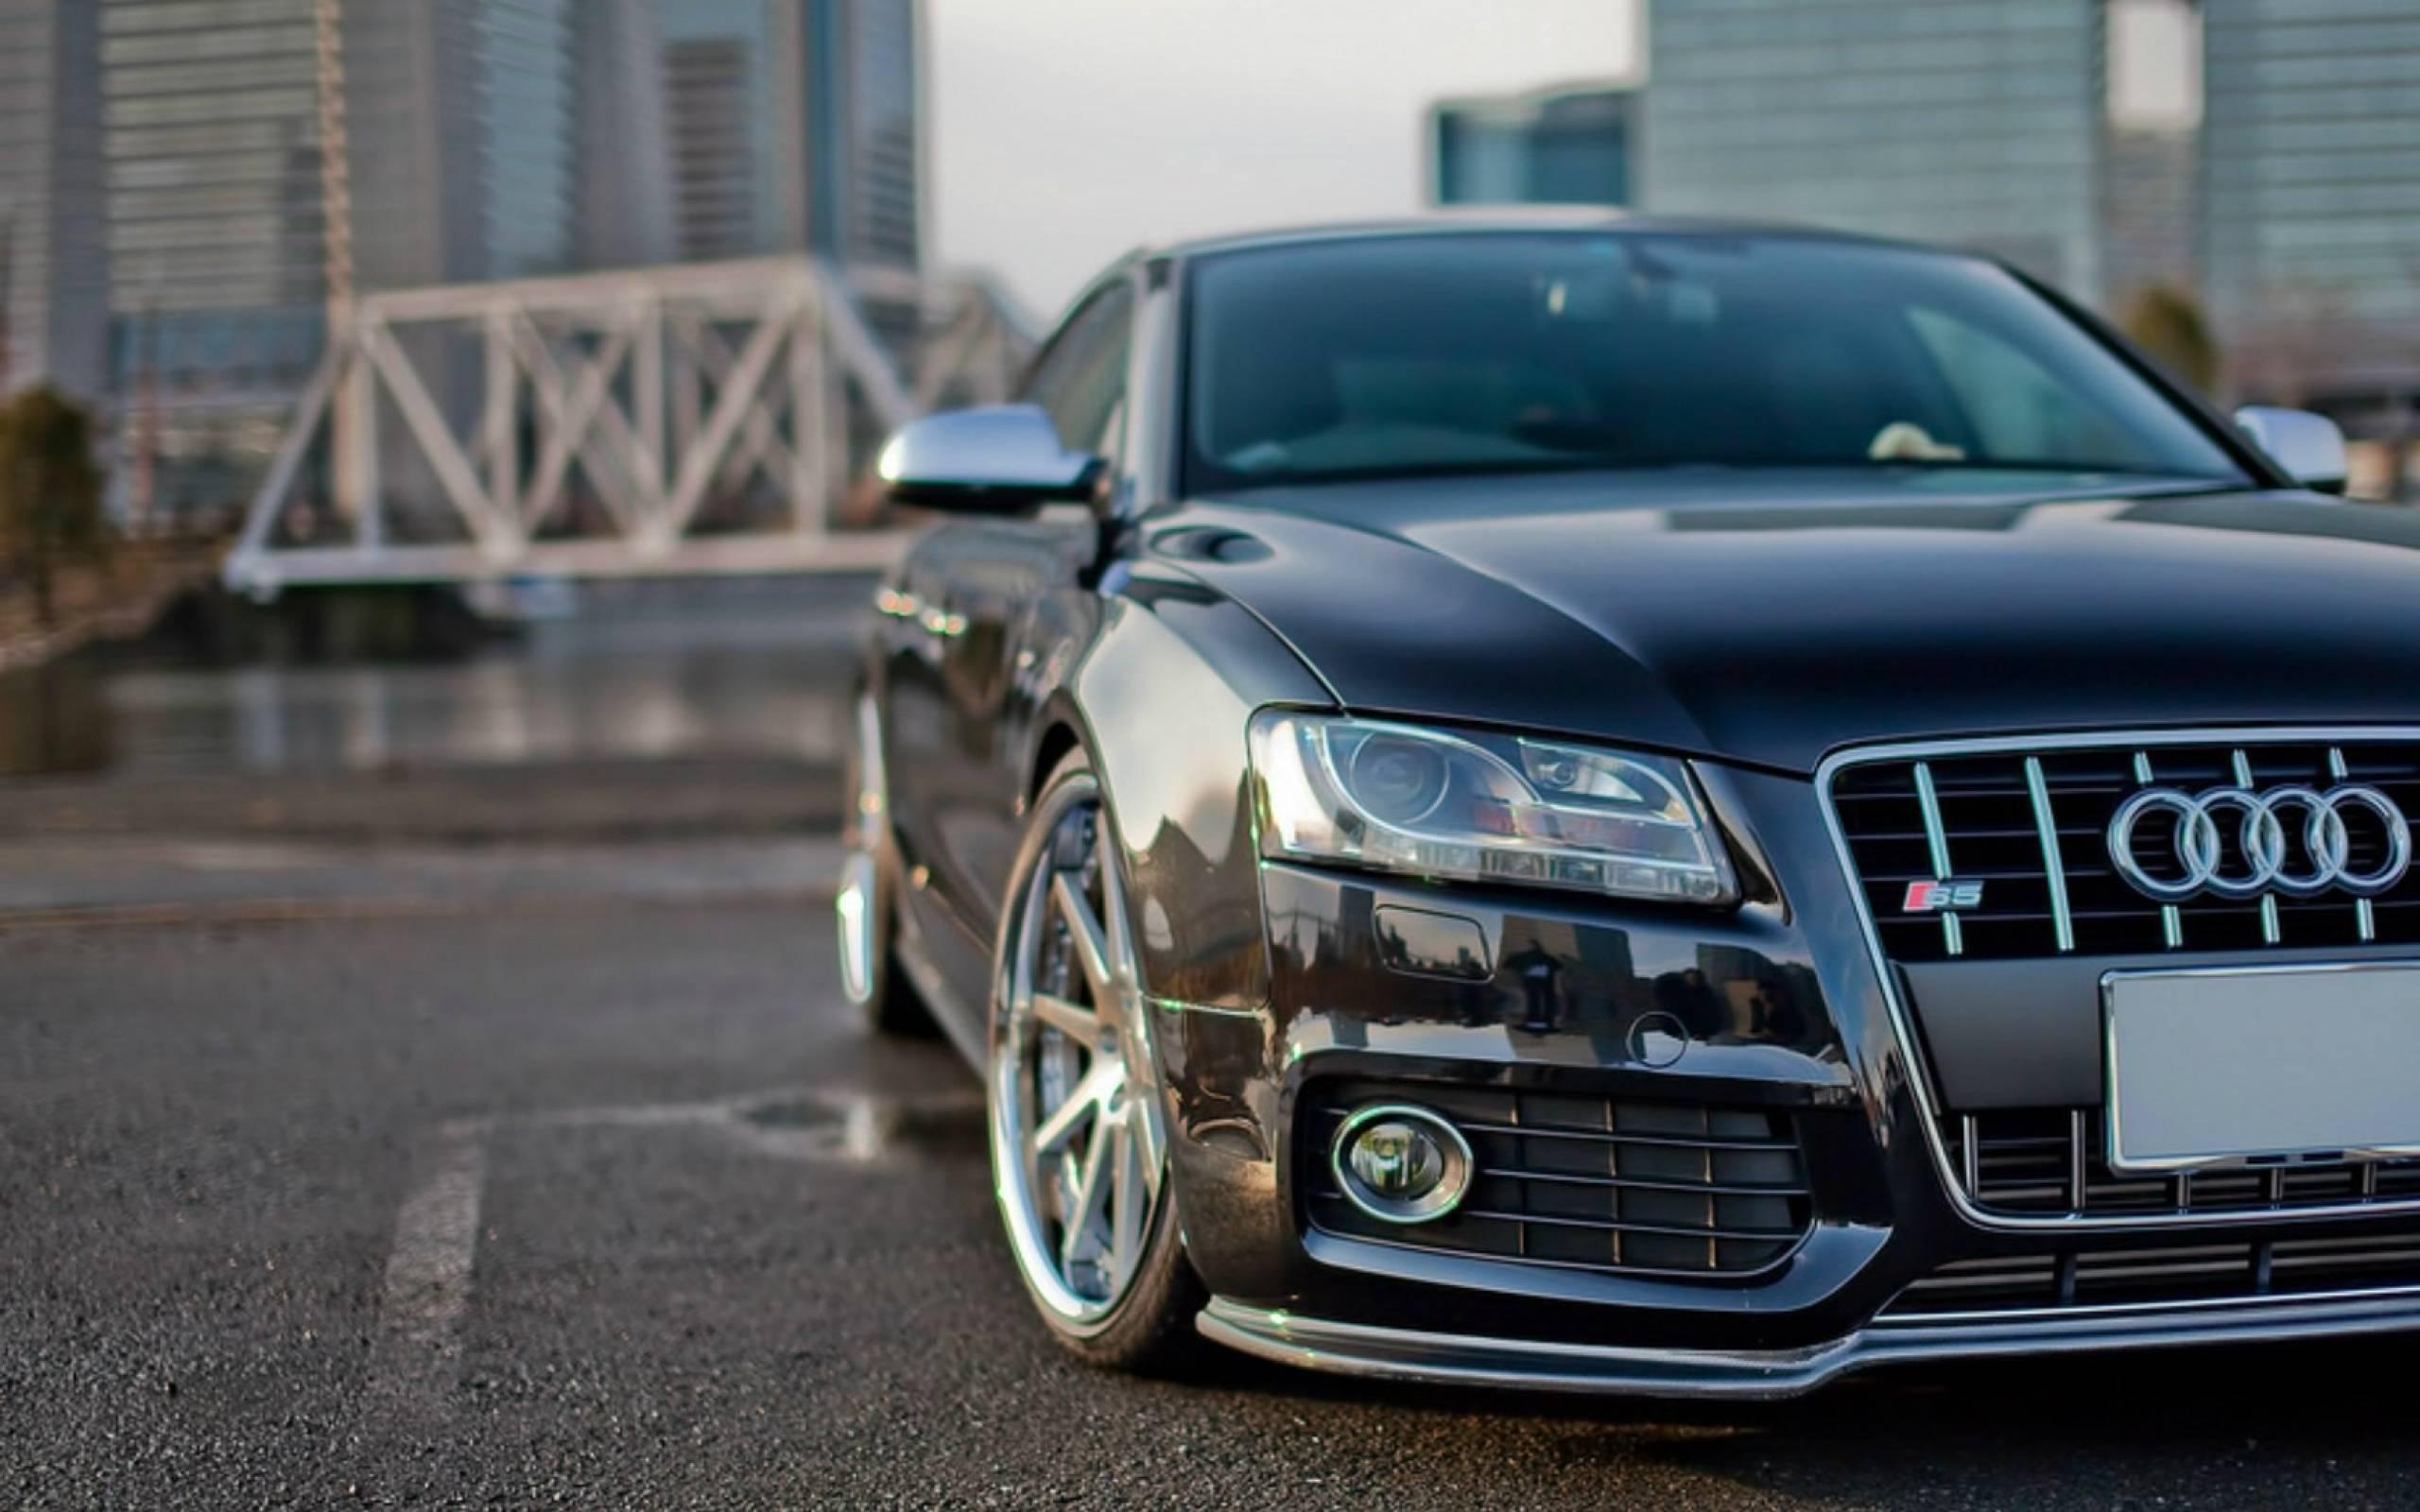 Audi S5 Wallpapers Wallpaper Cave